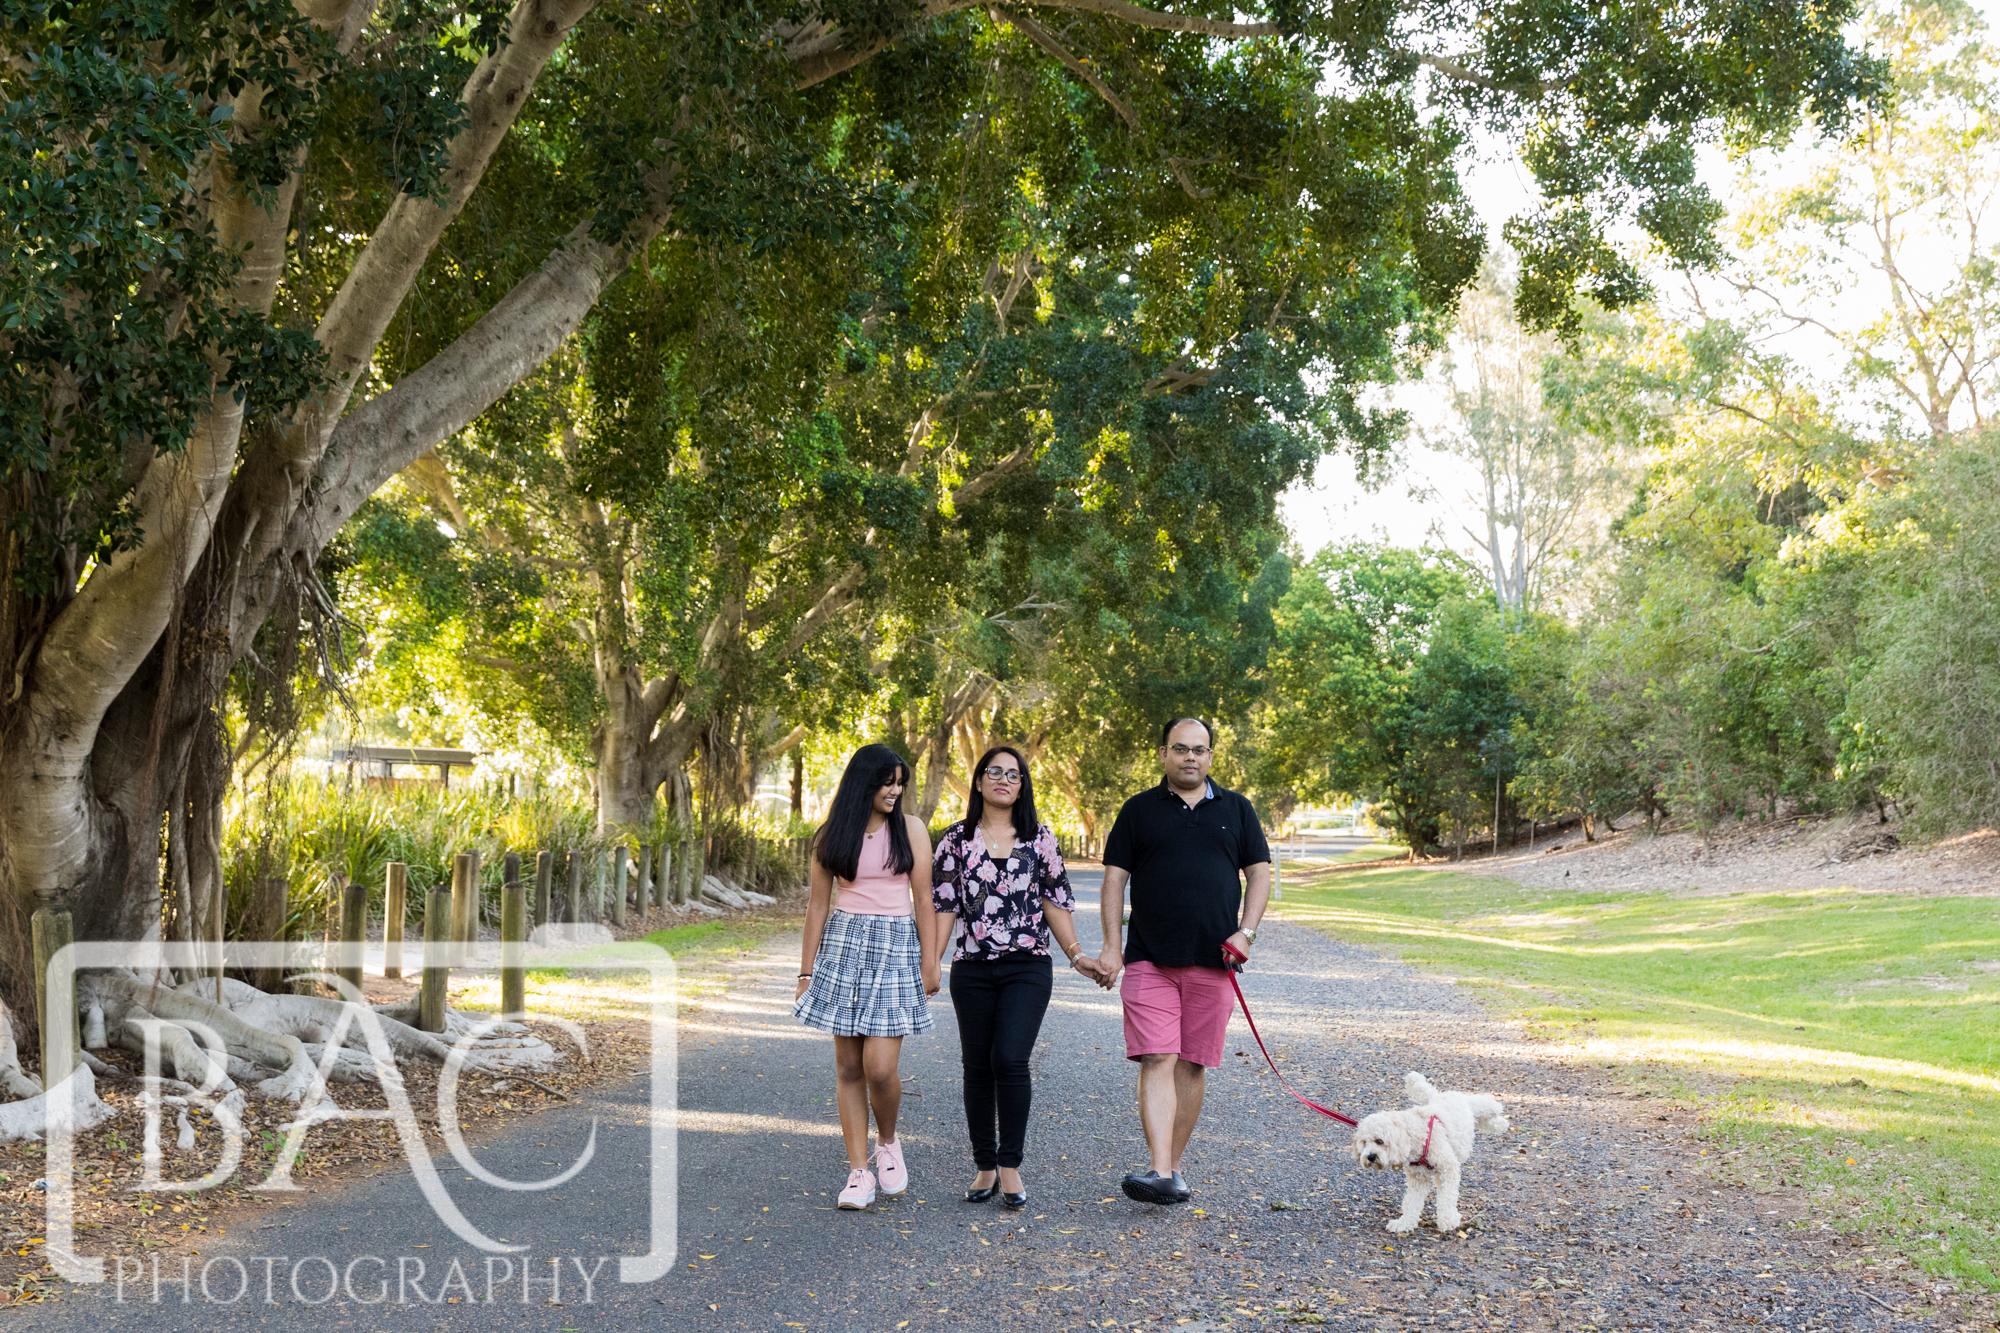 family portrait walking outdoor